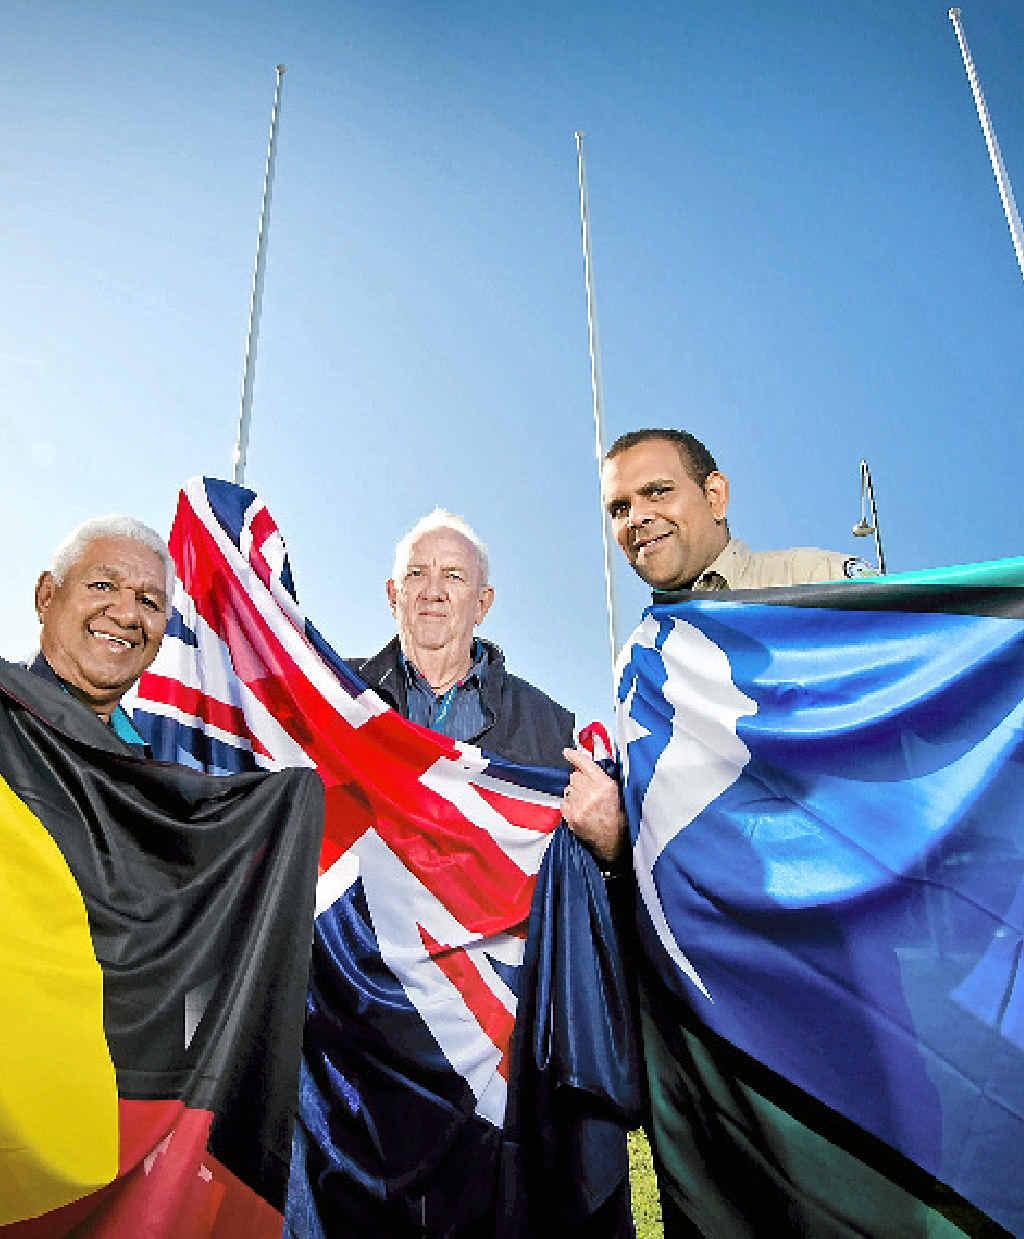 FLYING HIGH: Gooreng Gooreng Aboriginal elder Richard Johnson, Rotary Club of South Gladstone director Bruce Hunt and Torres Strait Islander Symeon Marou raise the three flags at Gallipoli Place.